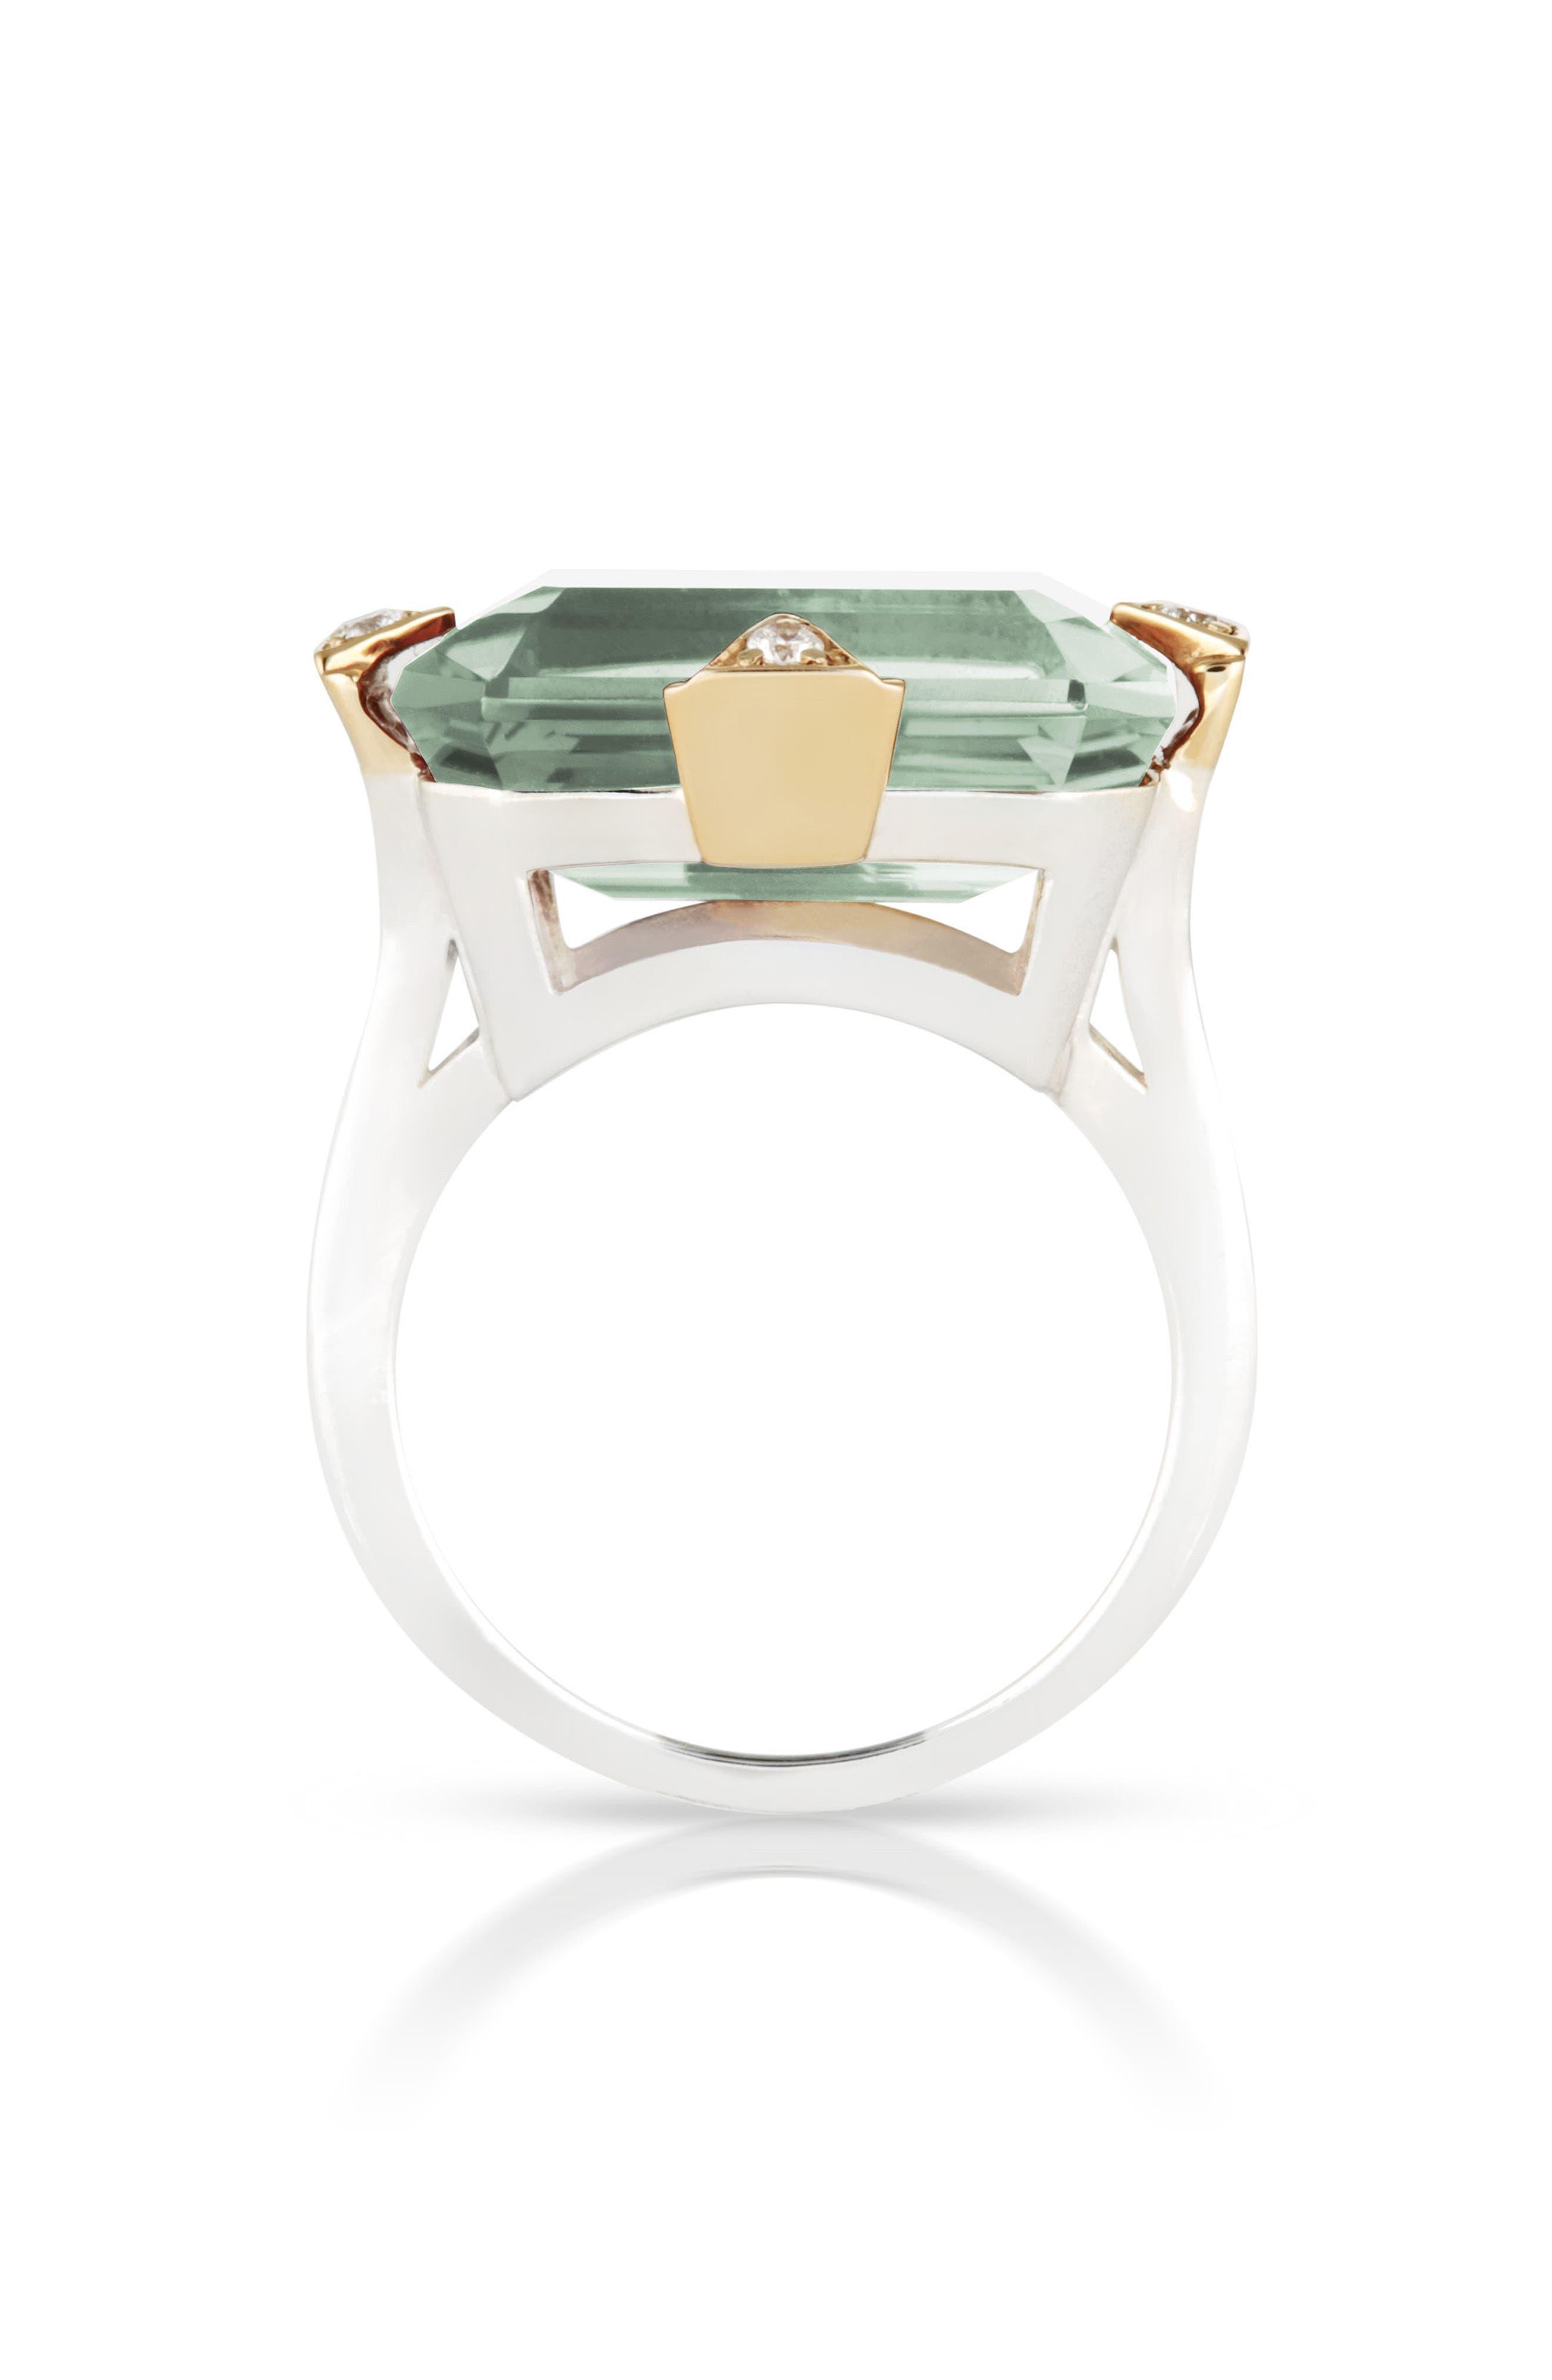 Prasiolite Cocktail Ring with Diamonds,                             Alternate thumbnail 2, color,                             PRASIOLITE